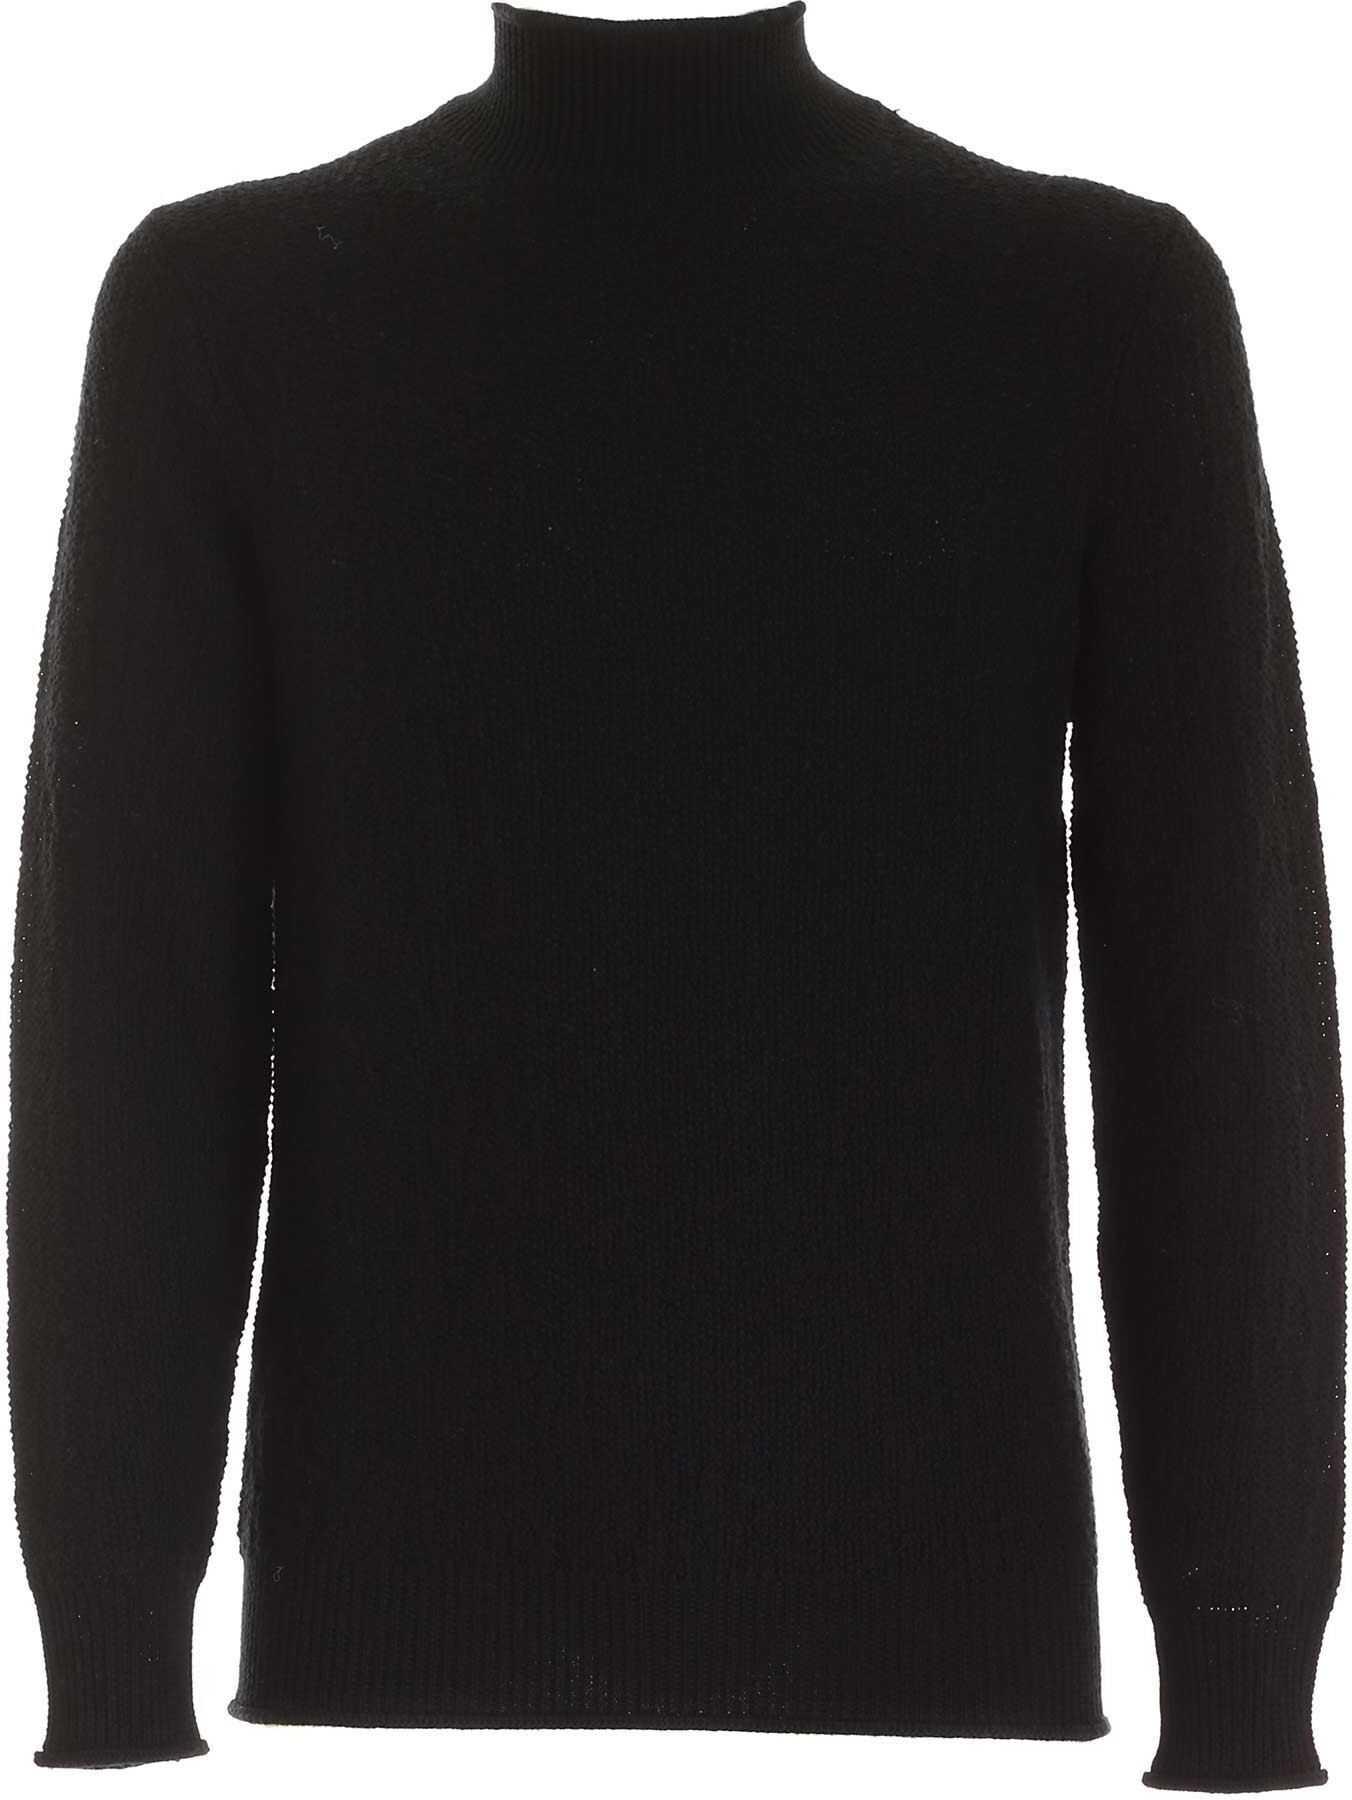 Kangra Cashmere High Neck Pullover In Black Black imagine